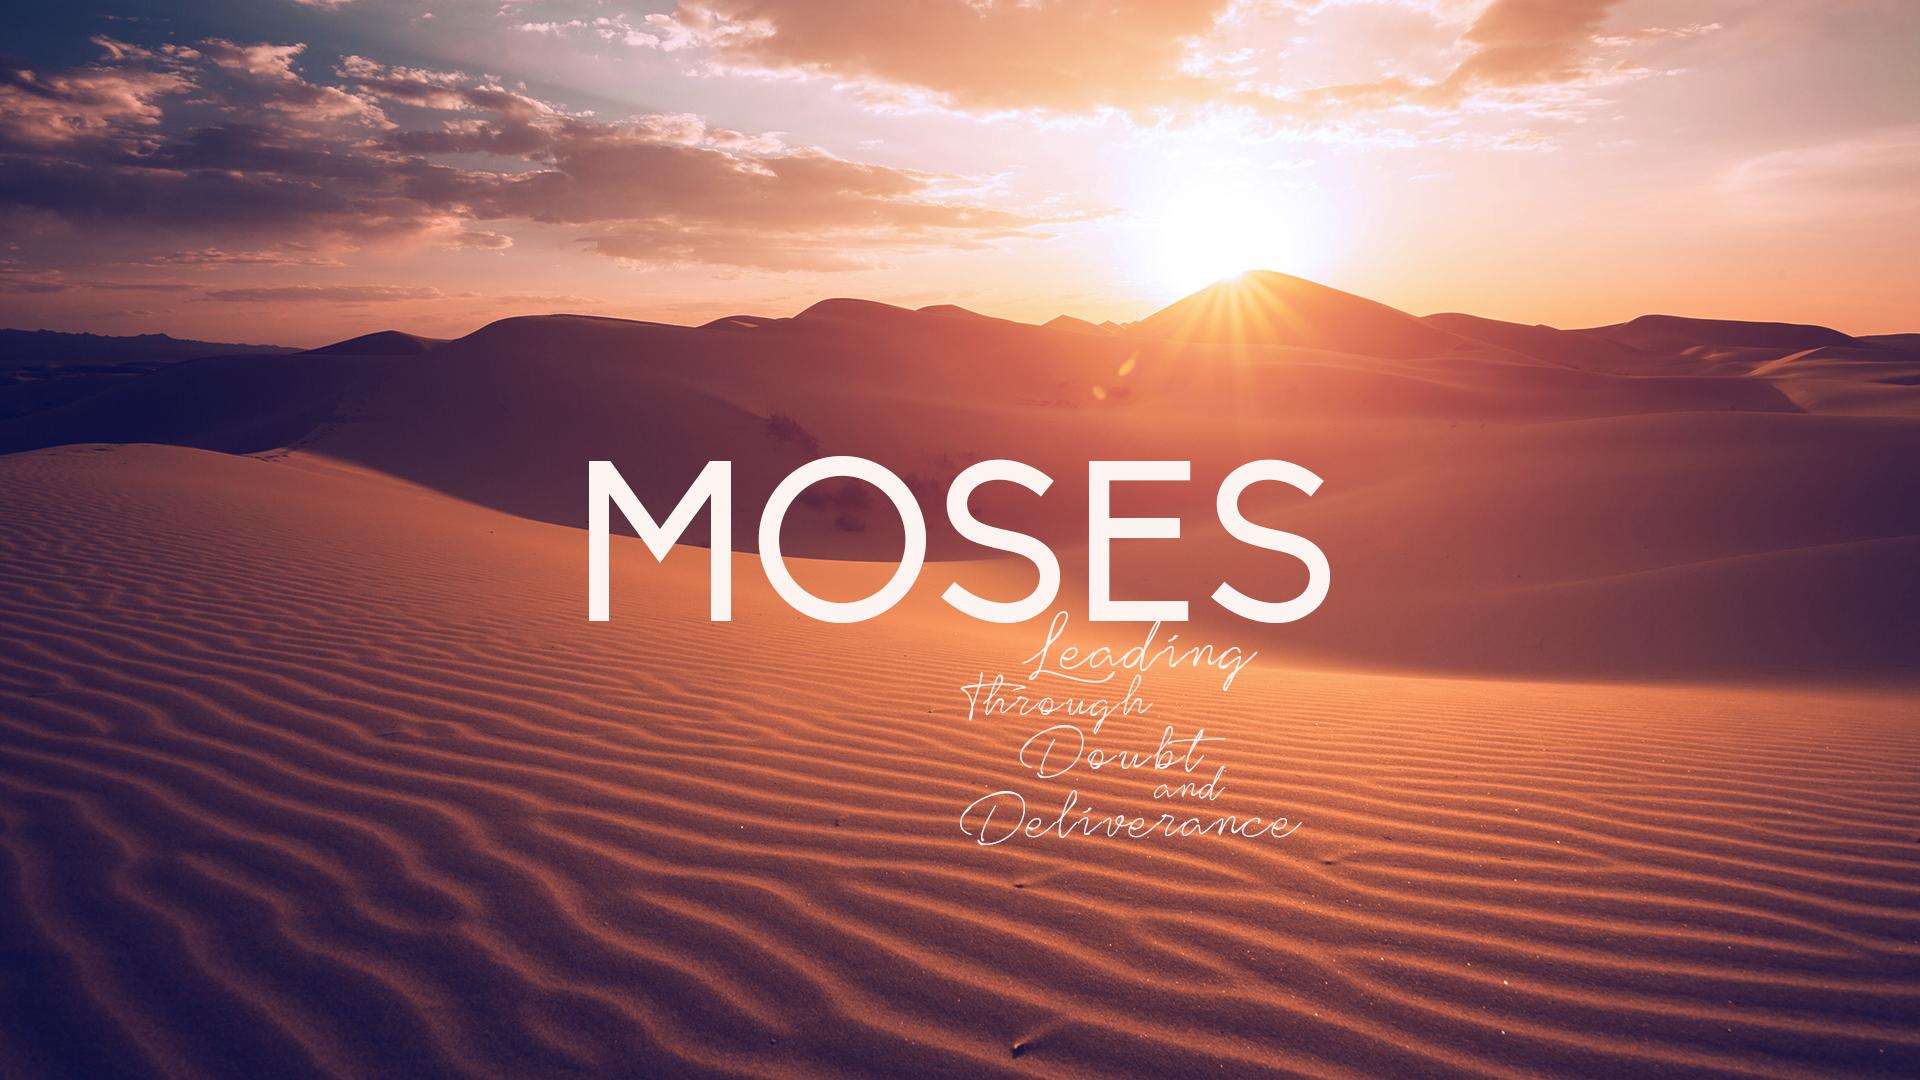 Moses-1920x1080.jpg